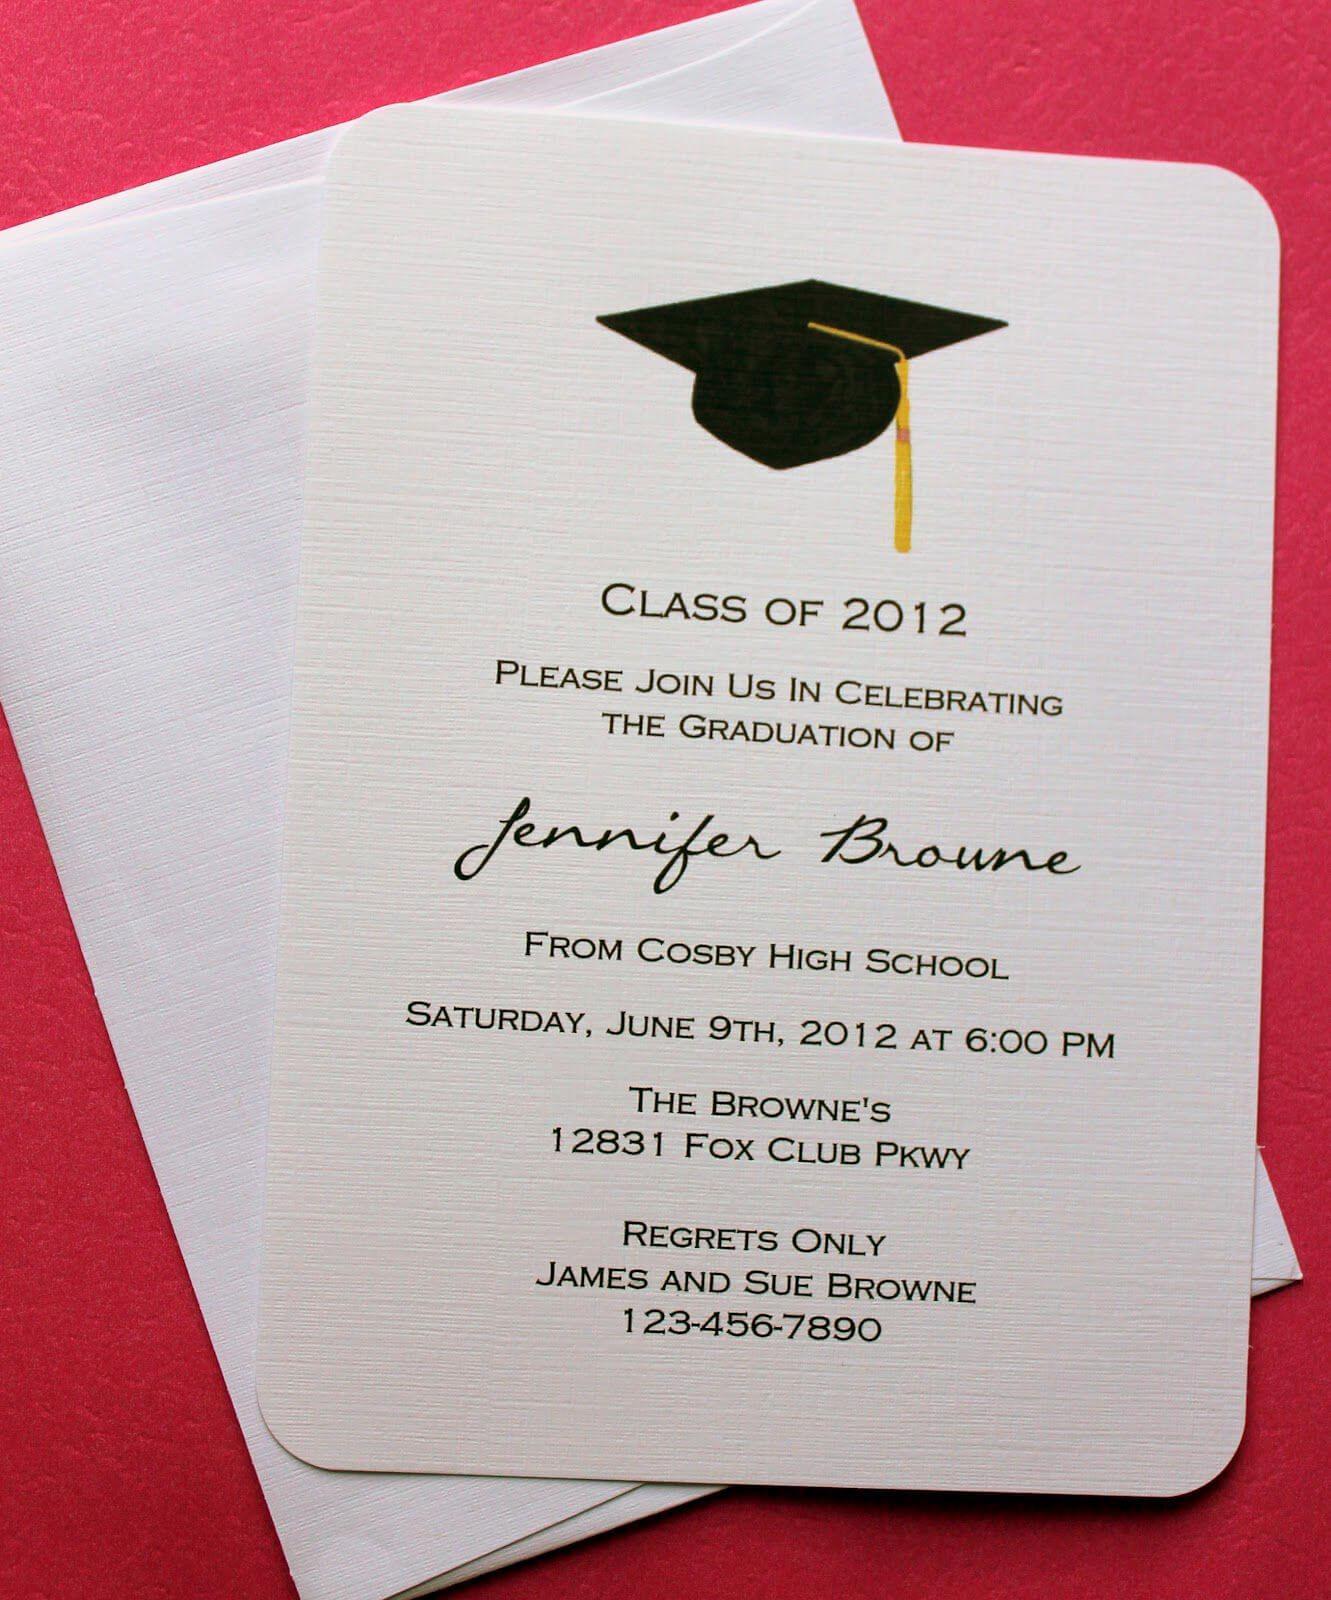 Graduation Invitation Templates Microsoft Word | Graduation Pertaining To Graduation Invitation Templates Microsoft Word